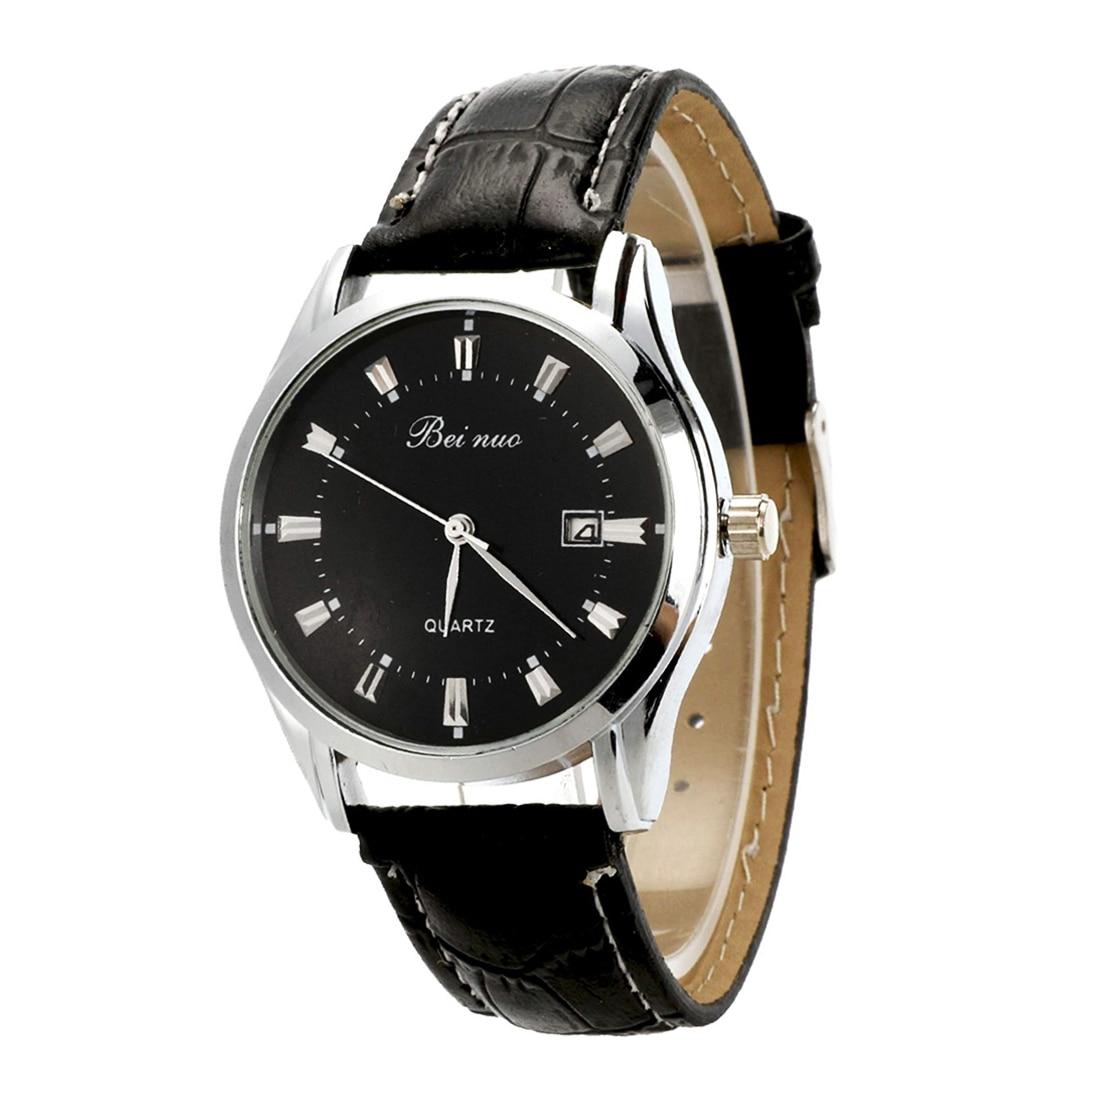 Beinuo Men Boy Sport Analog Quartz Alarm Auto Day Date Display Wrist Watch Leather band Black+Black цена и фото